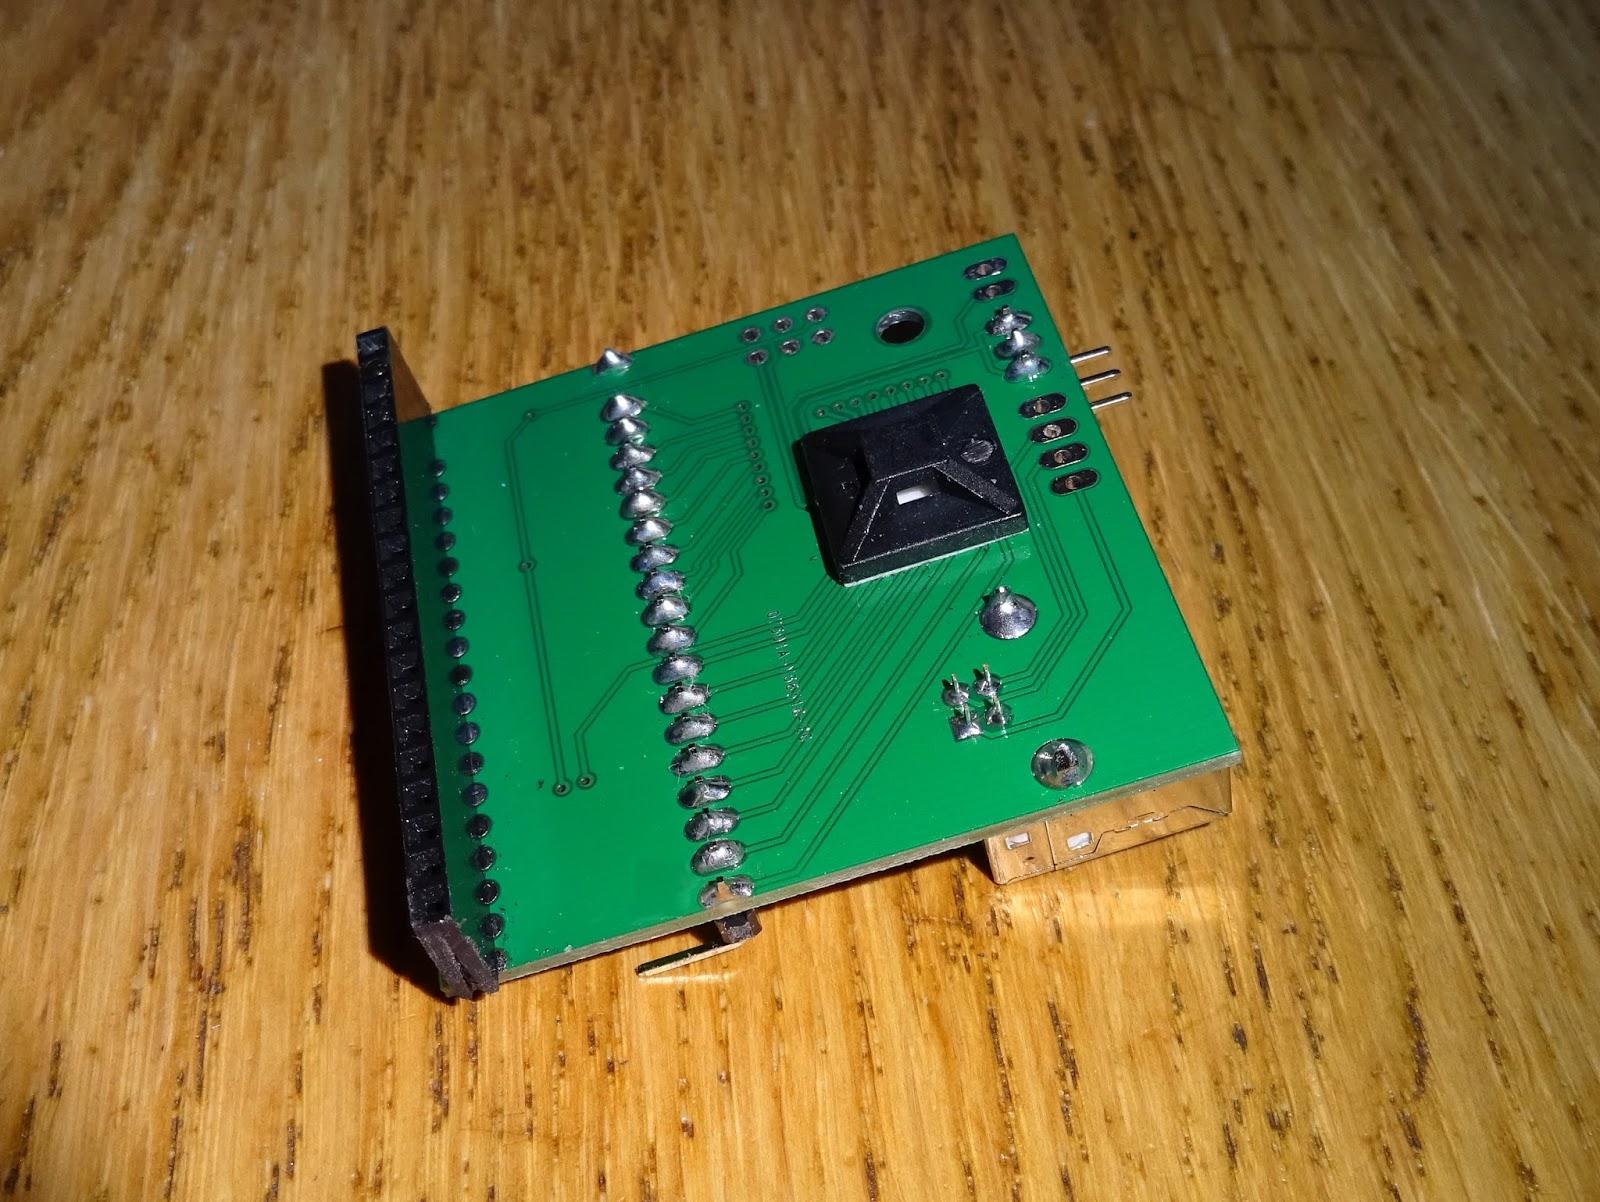 Retropie C64 Controller Setup